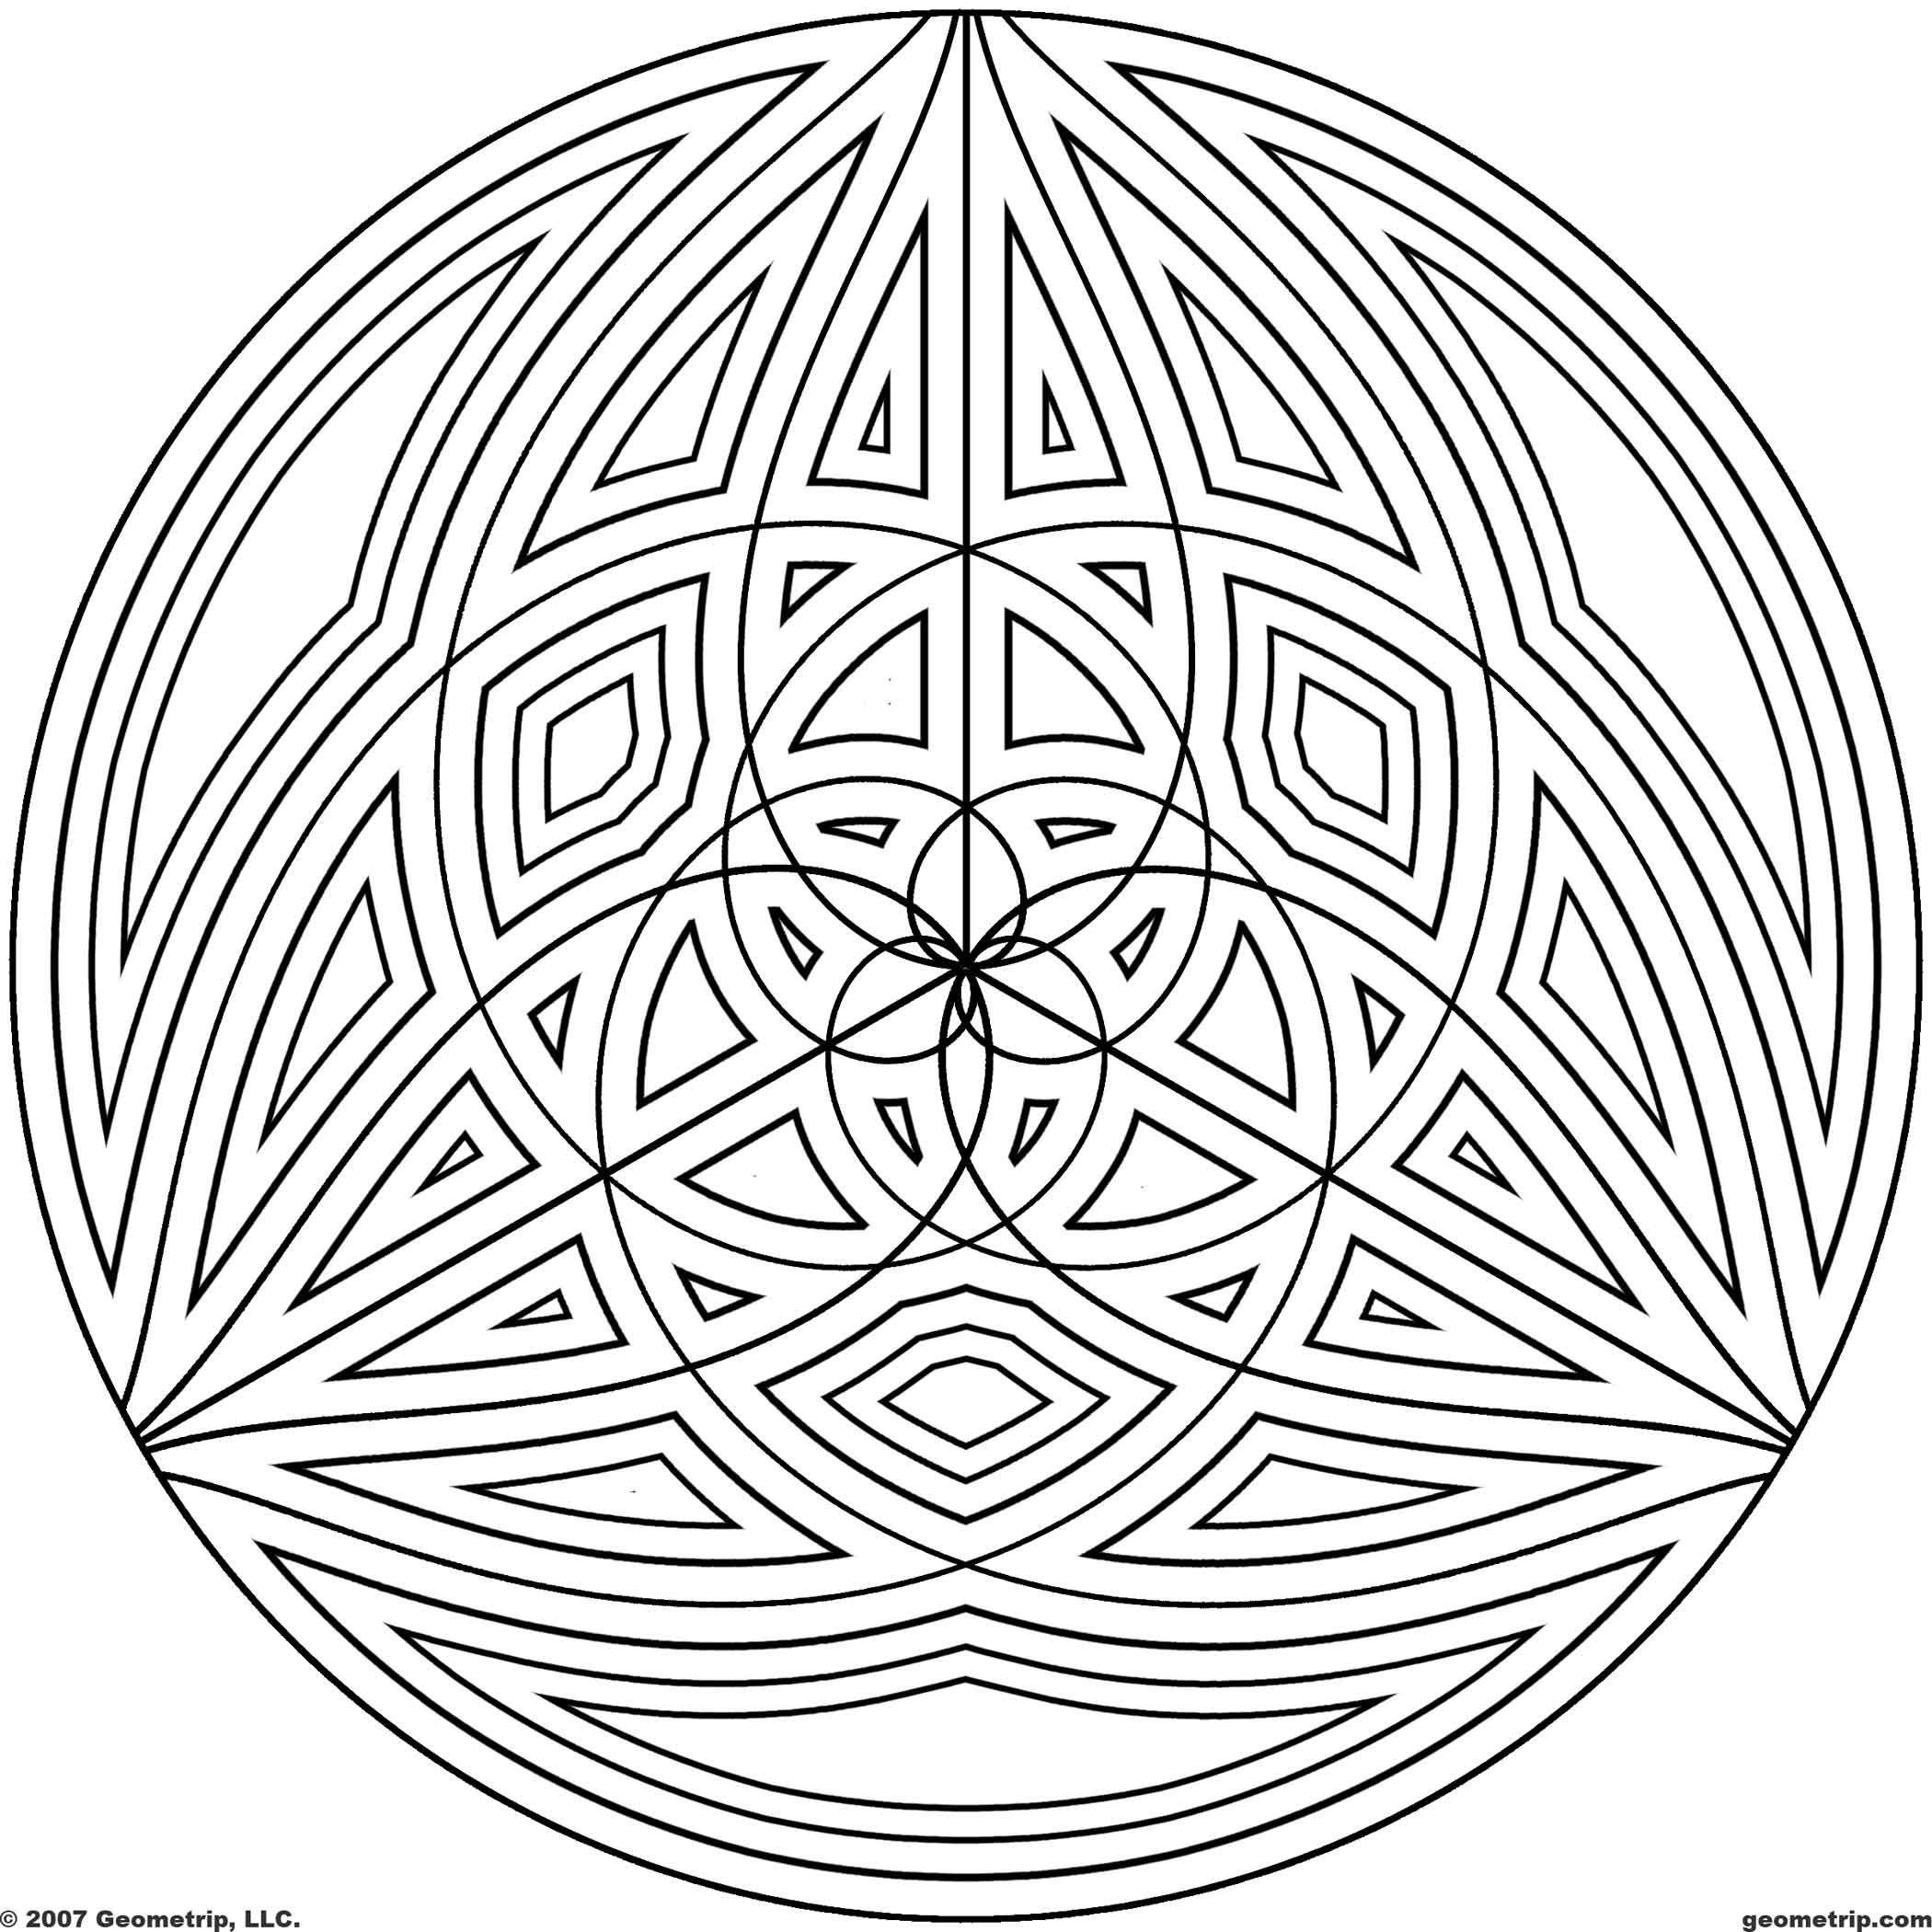 coloring circle patterns pin on colouring pages coloring circle patterns